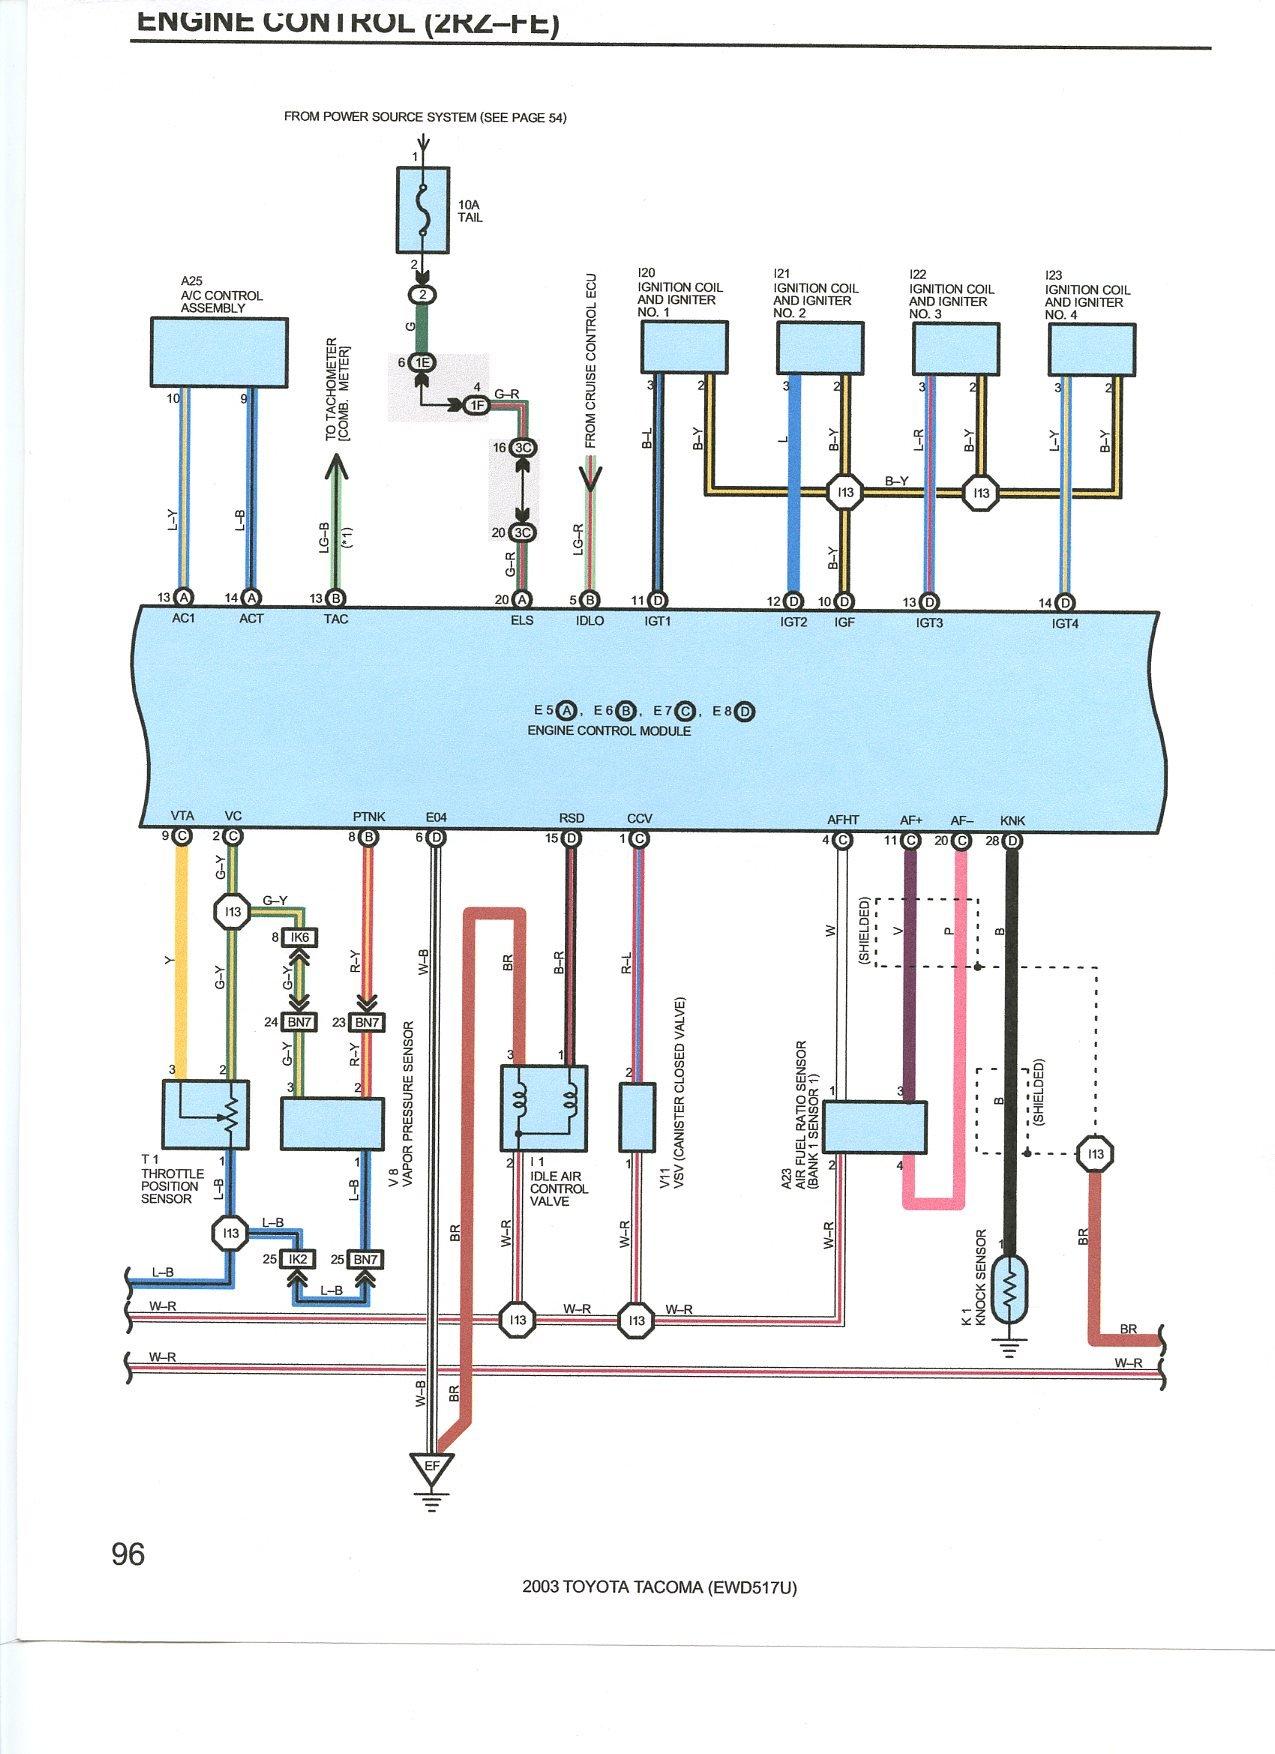 My 2000 Tacoma Prerunner 2 7 Engine Has Codes P0300  P0302